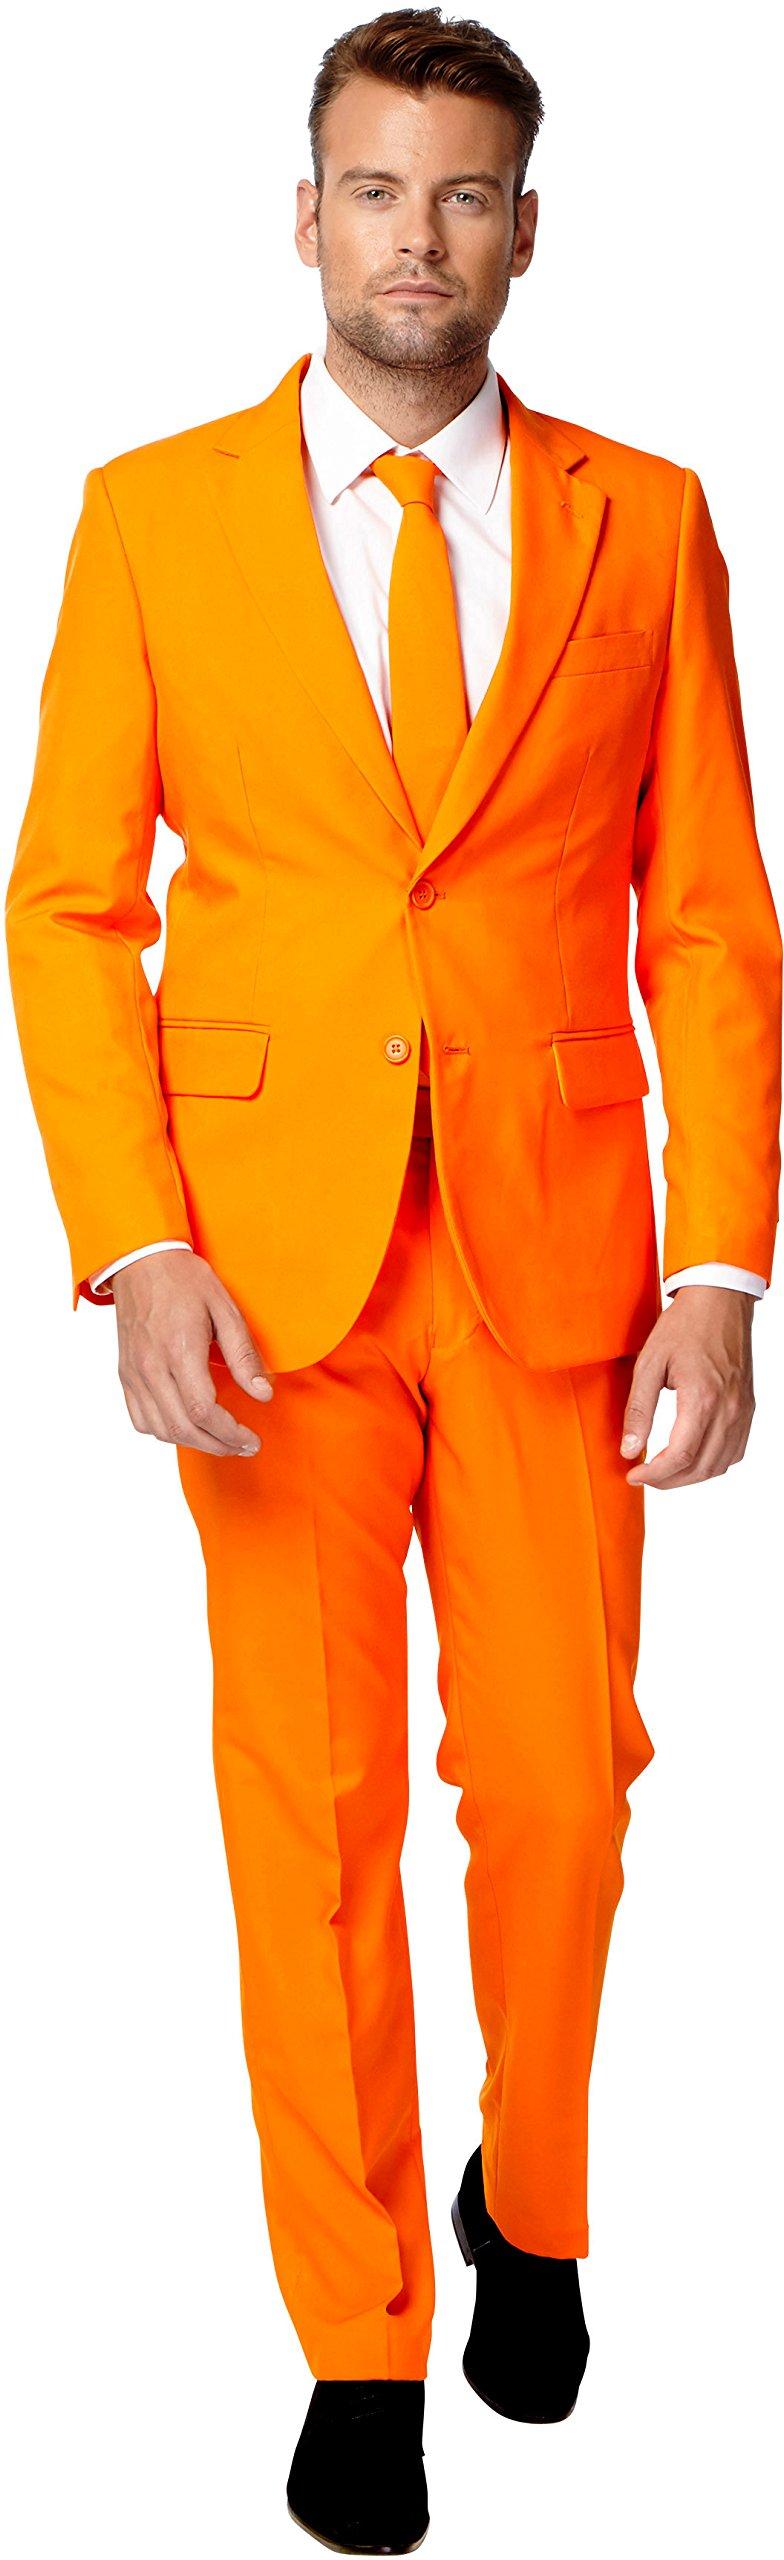 OppoSuits Men's Party Costume Suit, Orange, 44